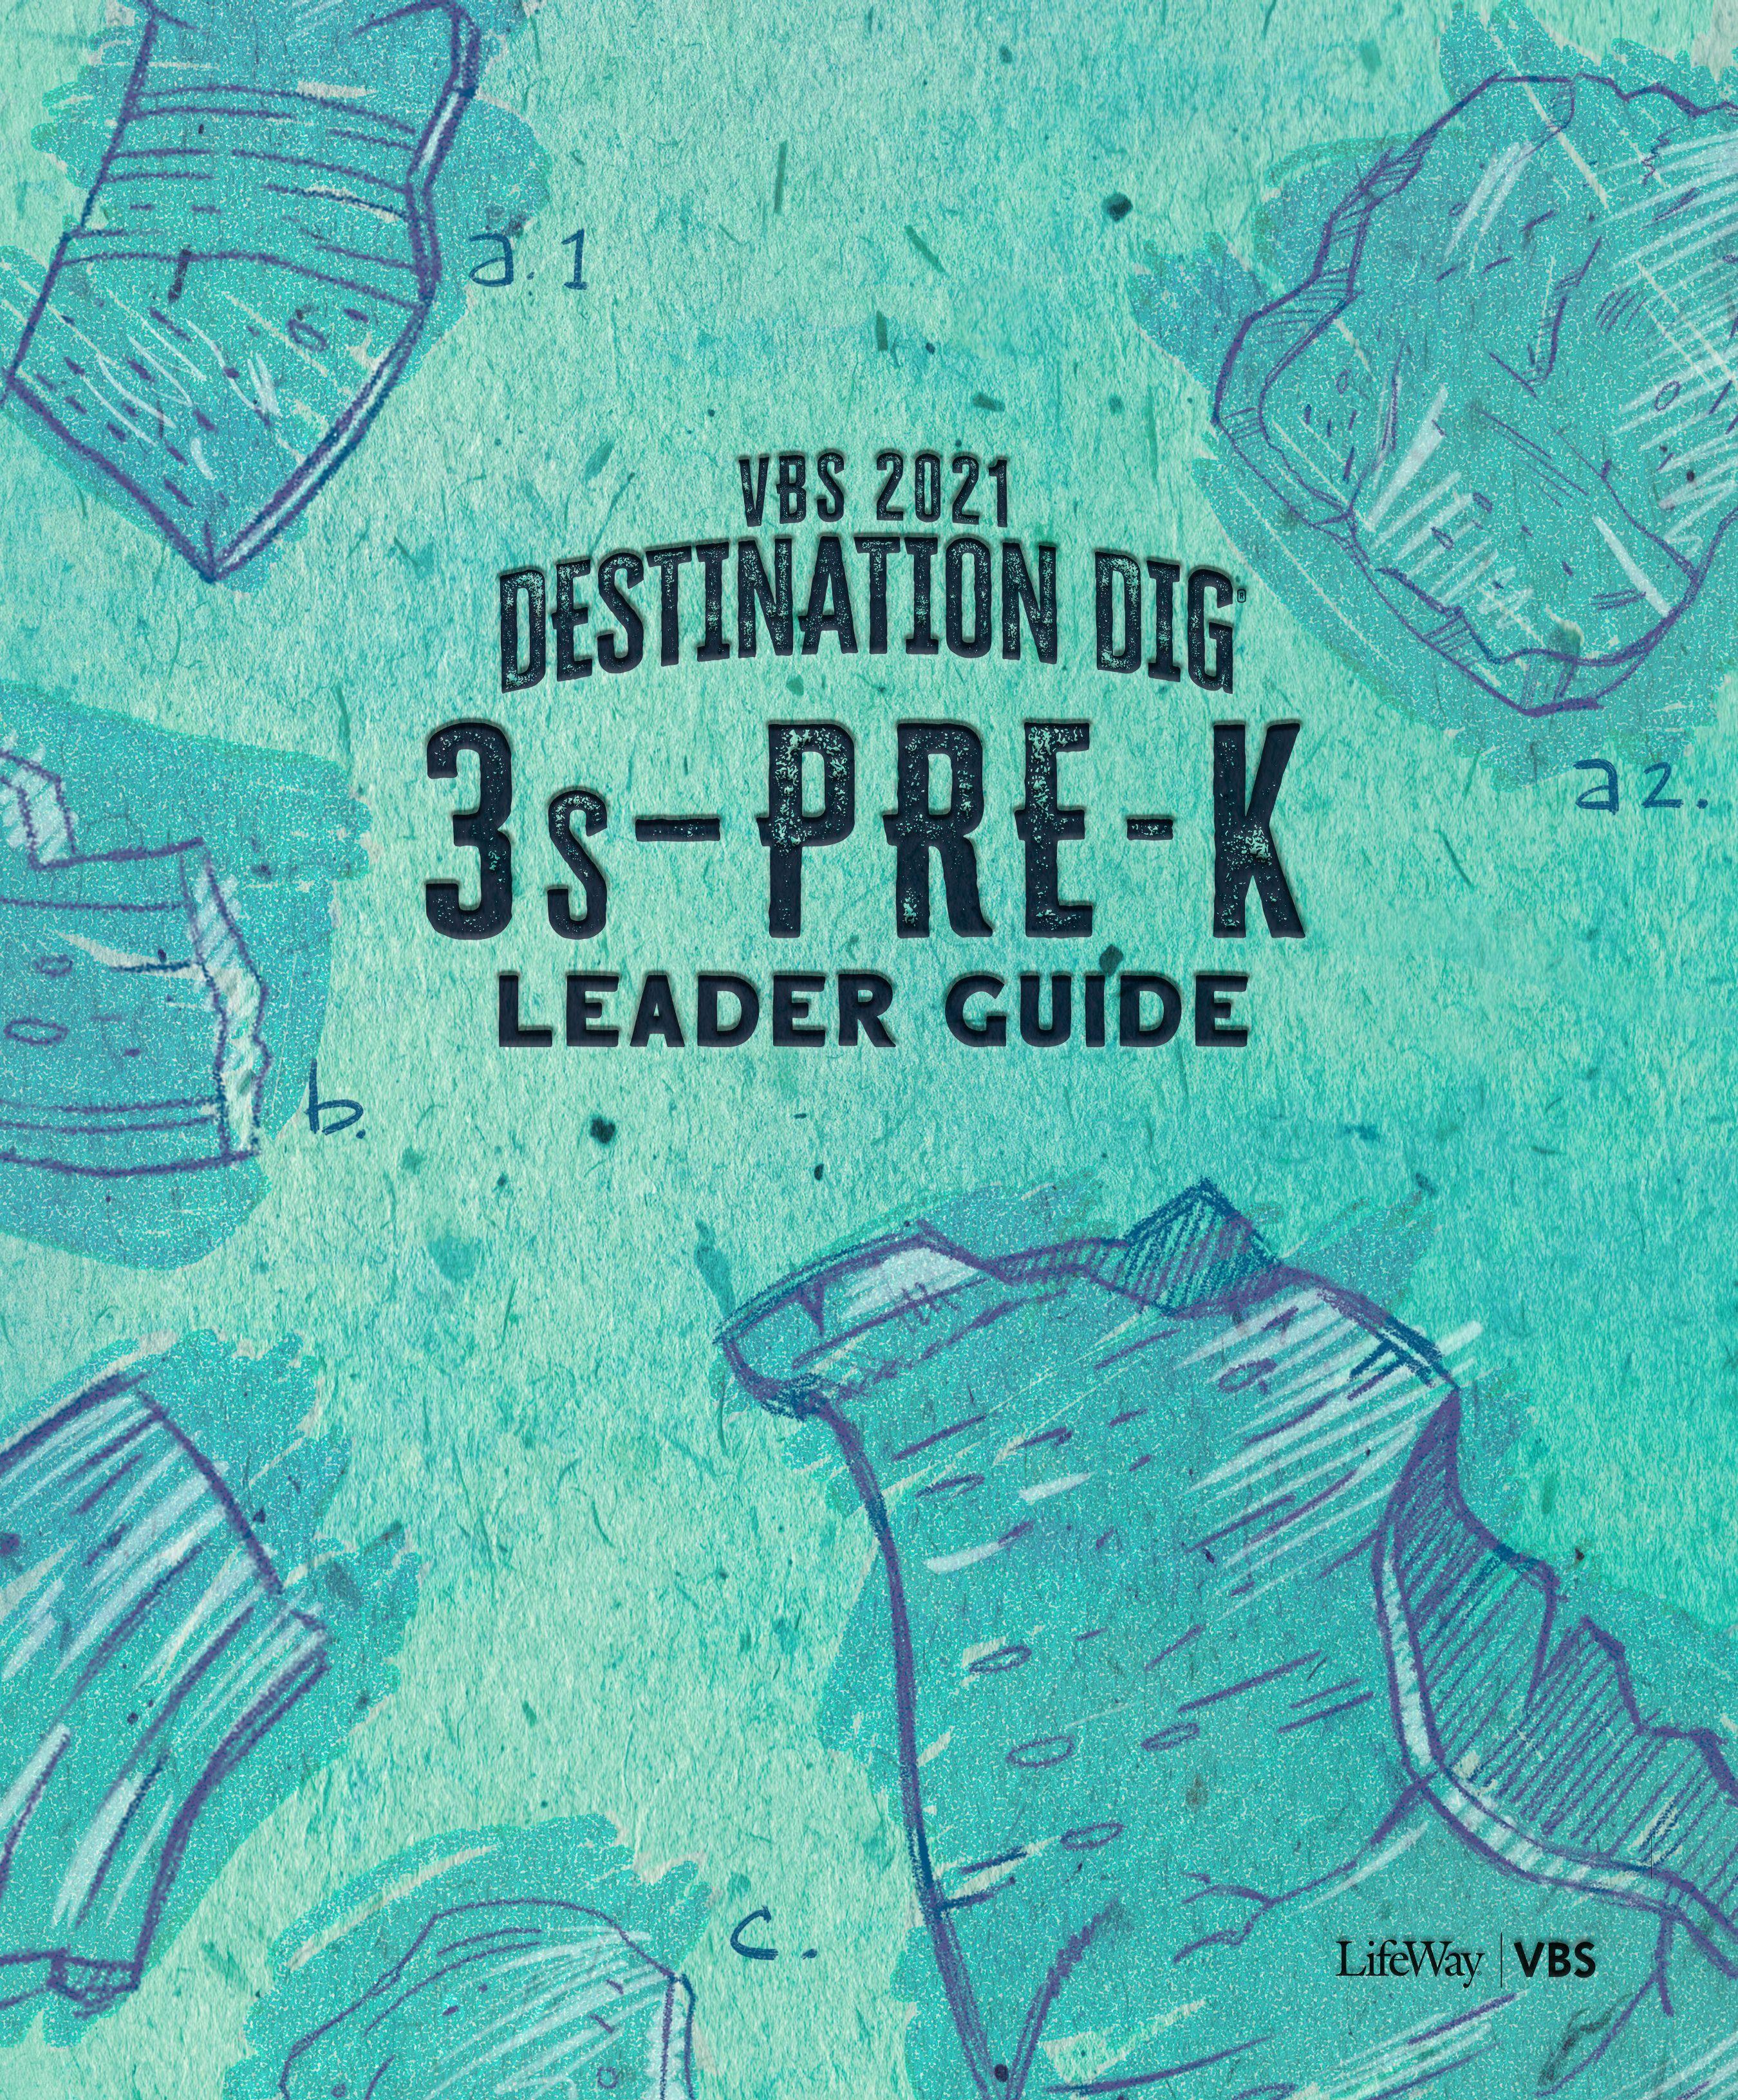 2s-PreK Leader Guide